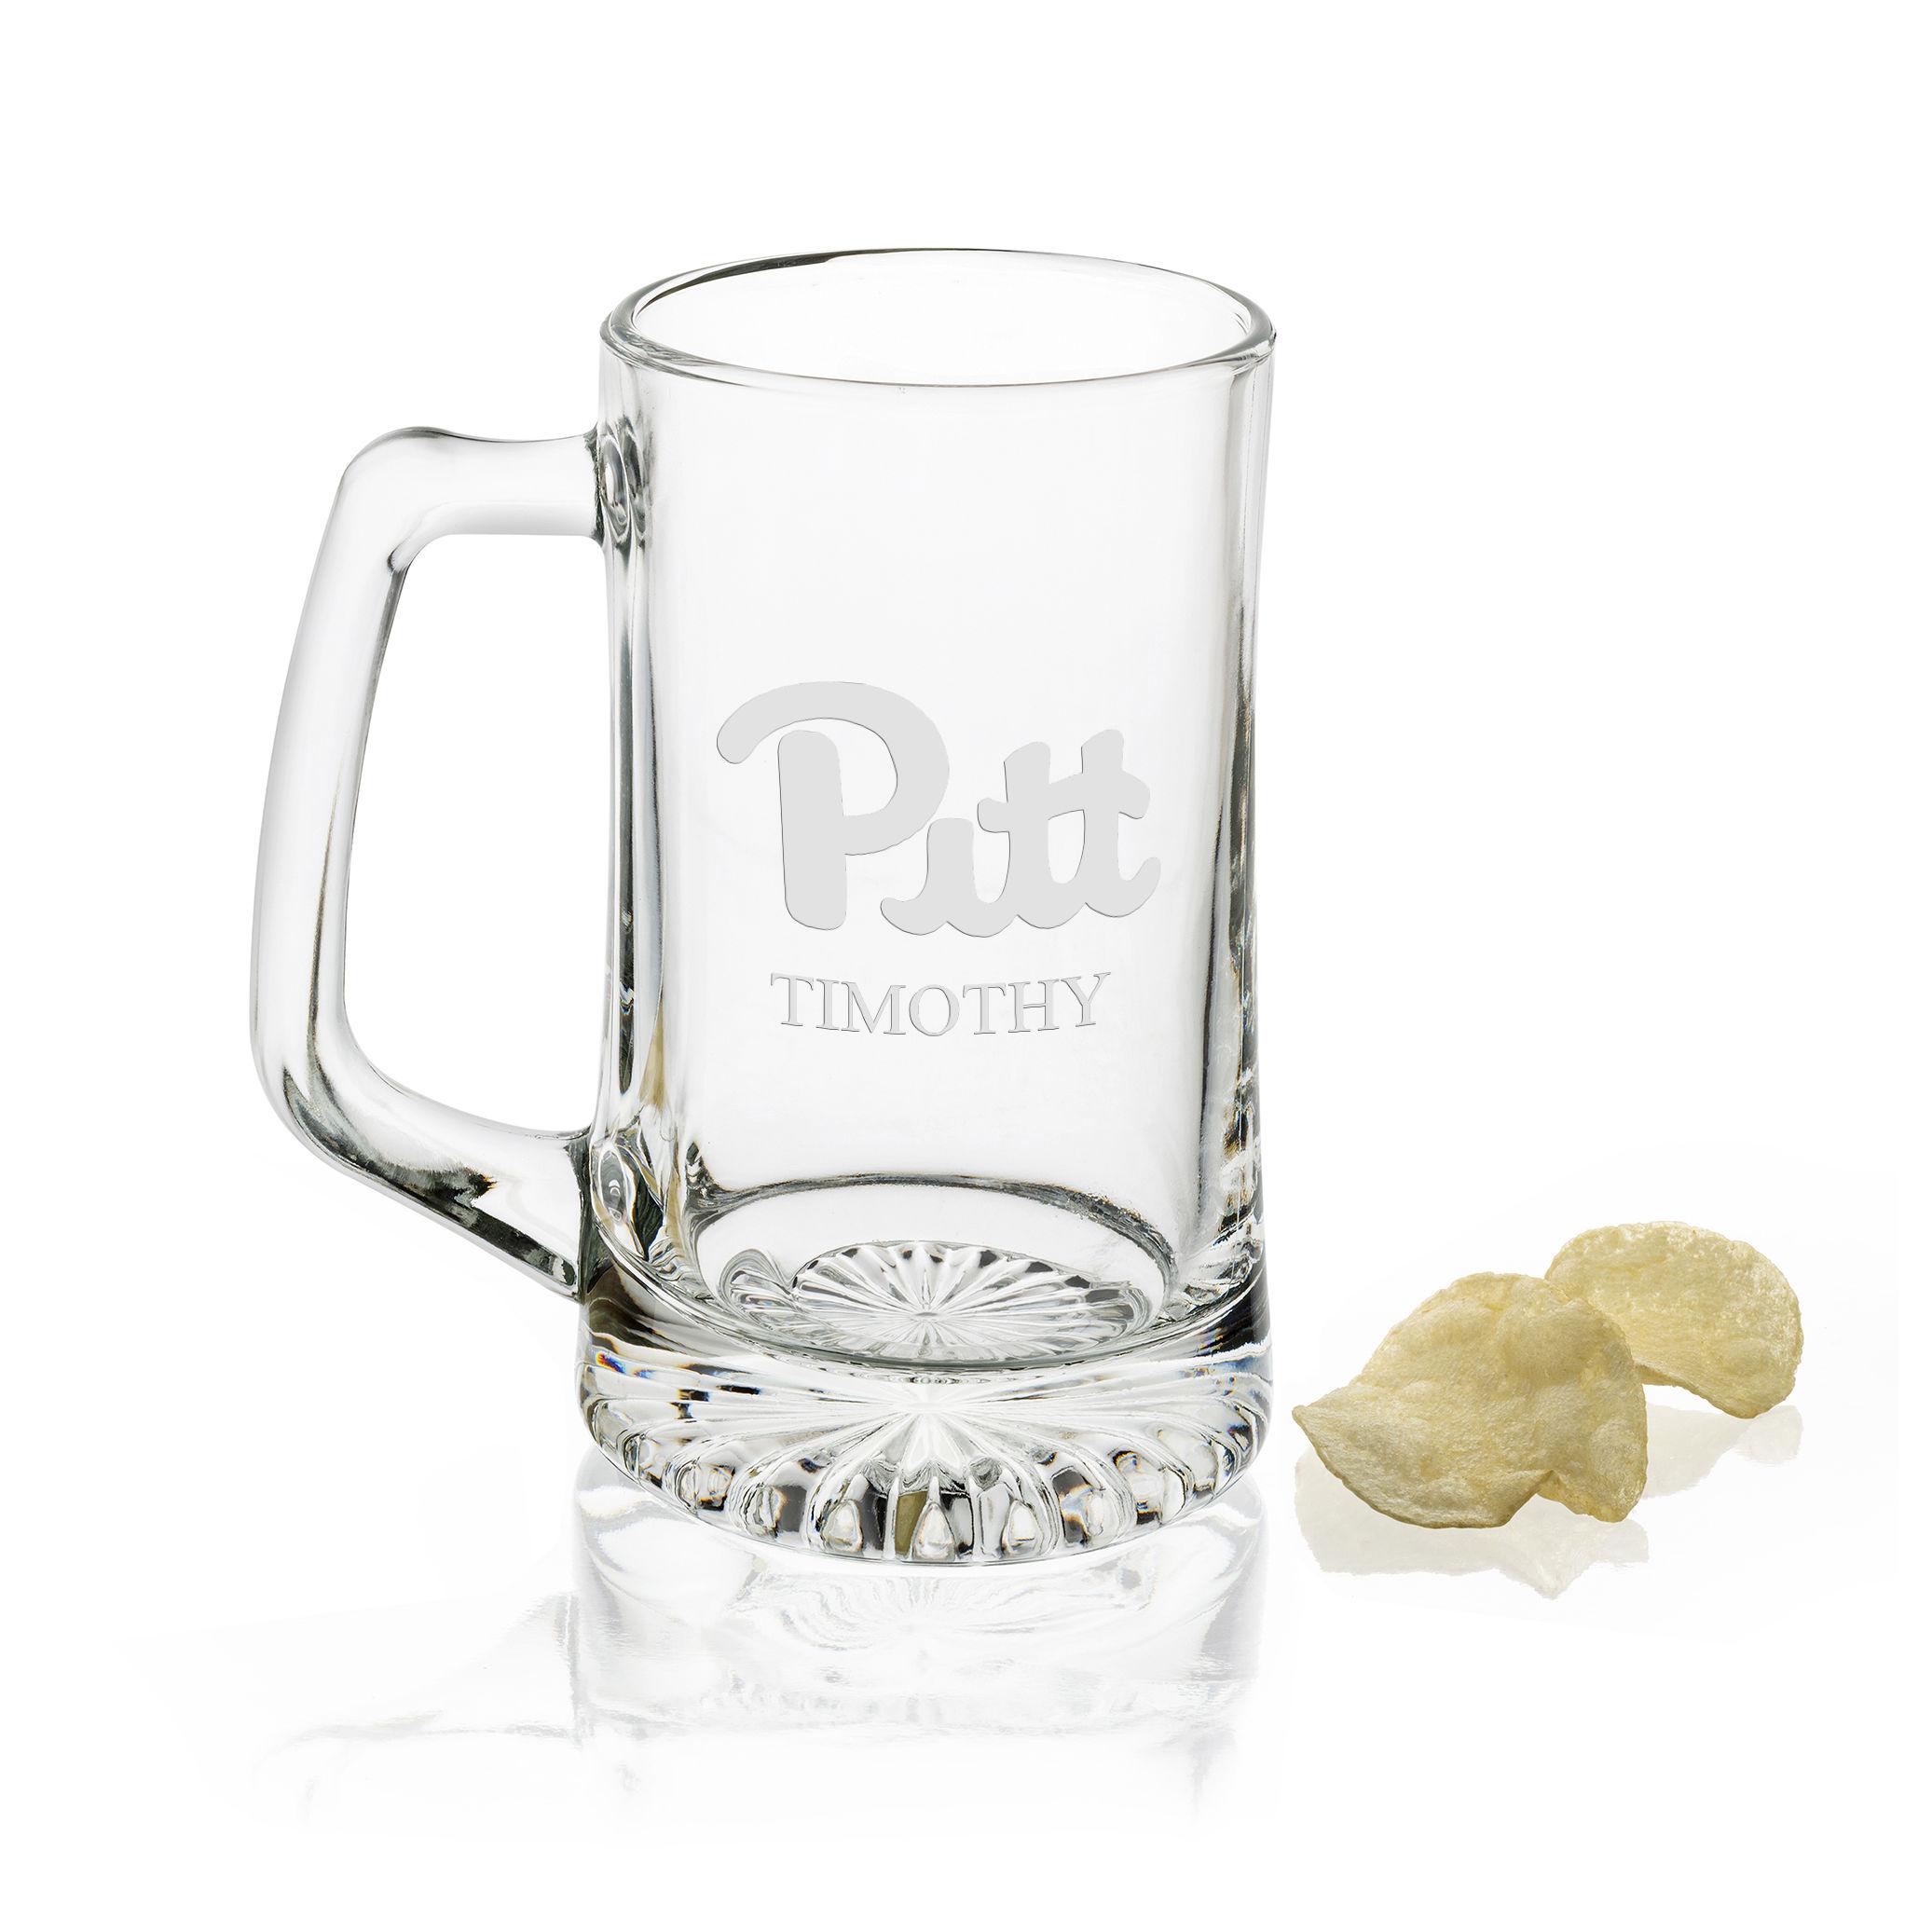 Pitt 25 oz Beer Mug